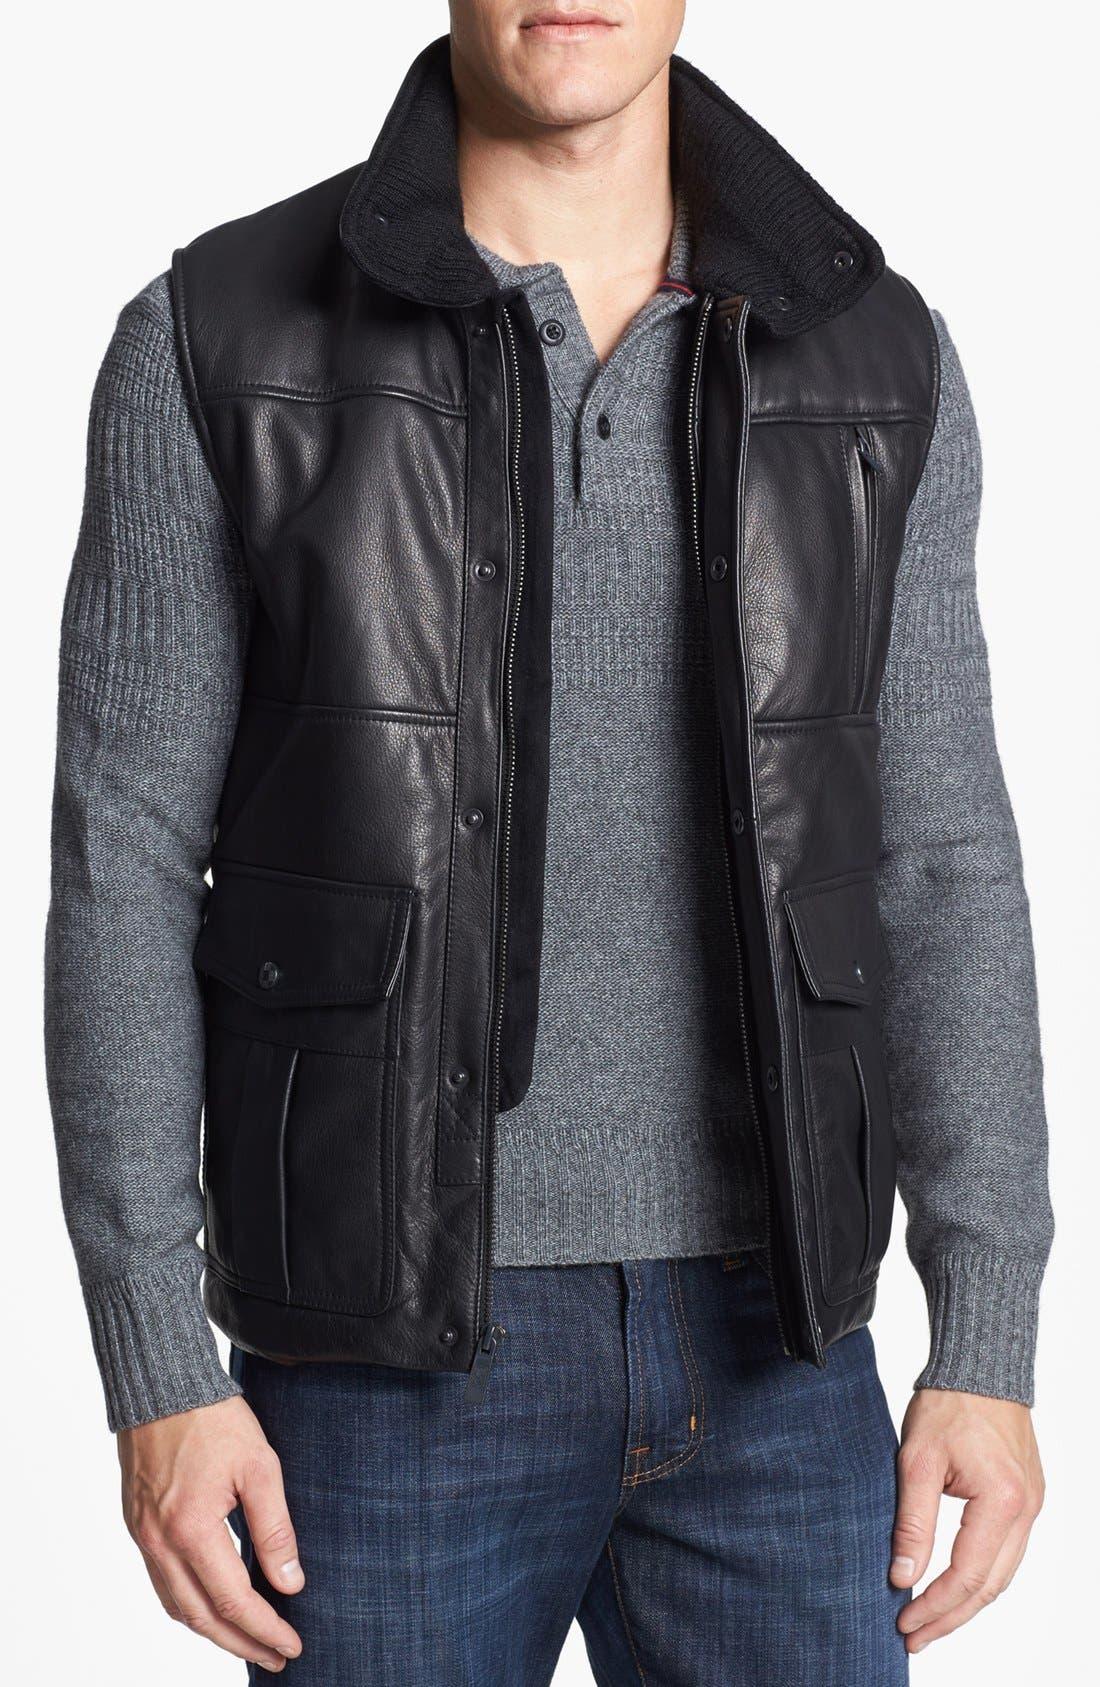 Main Image - Vince Camuto Leather Vest